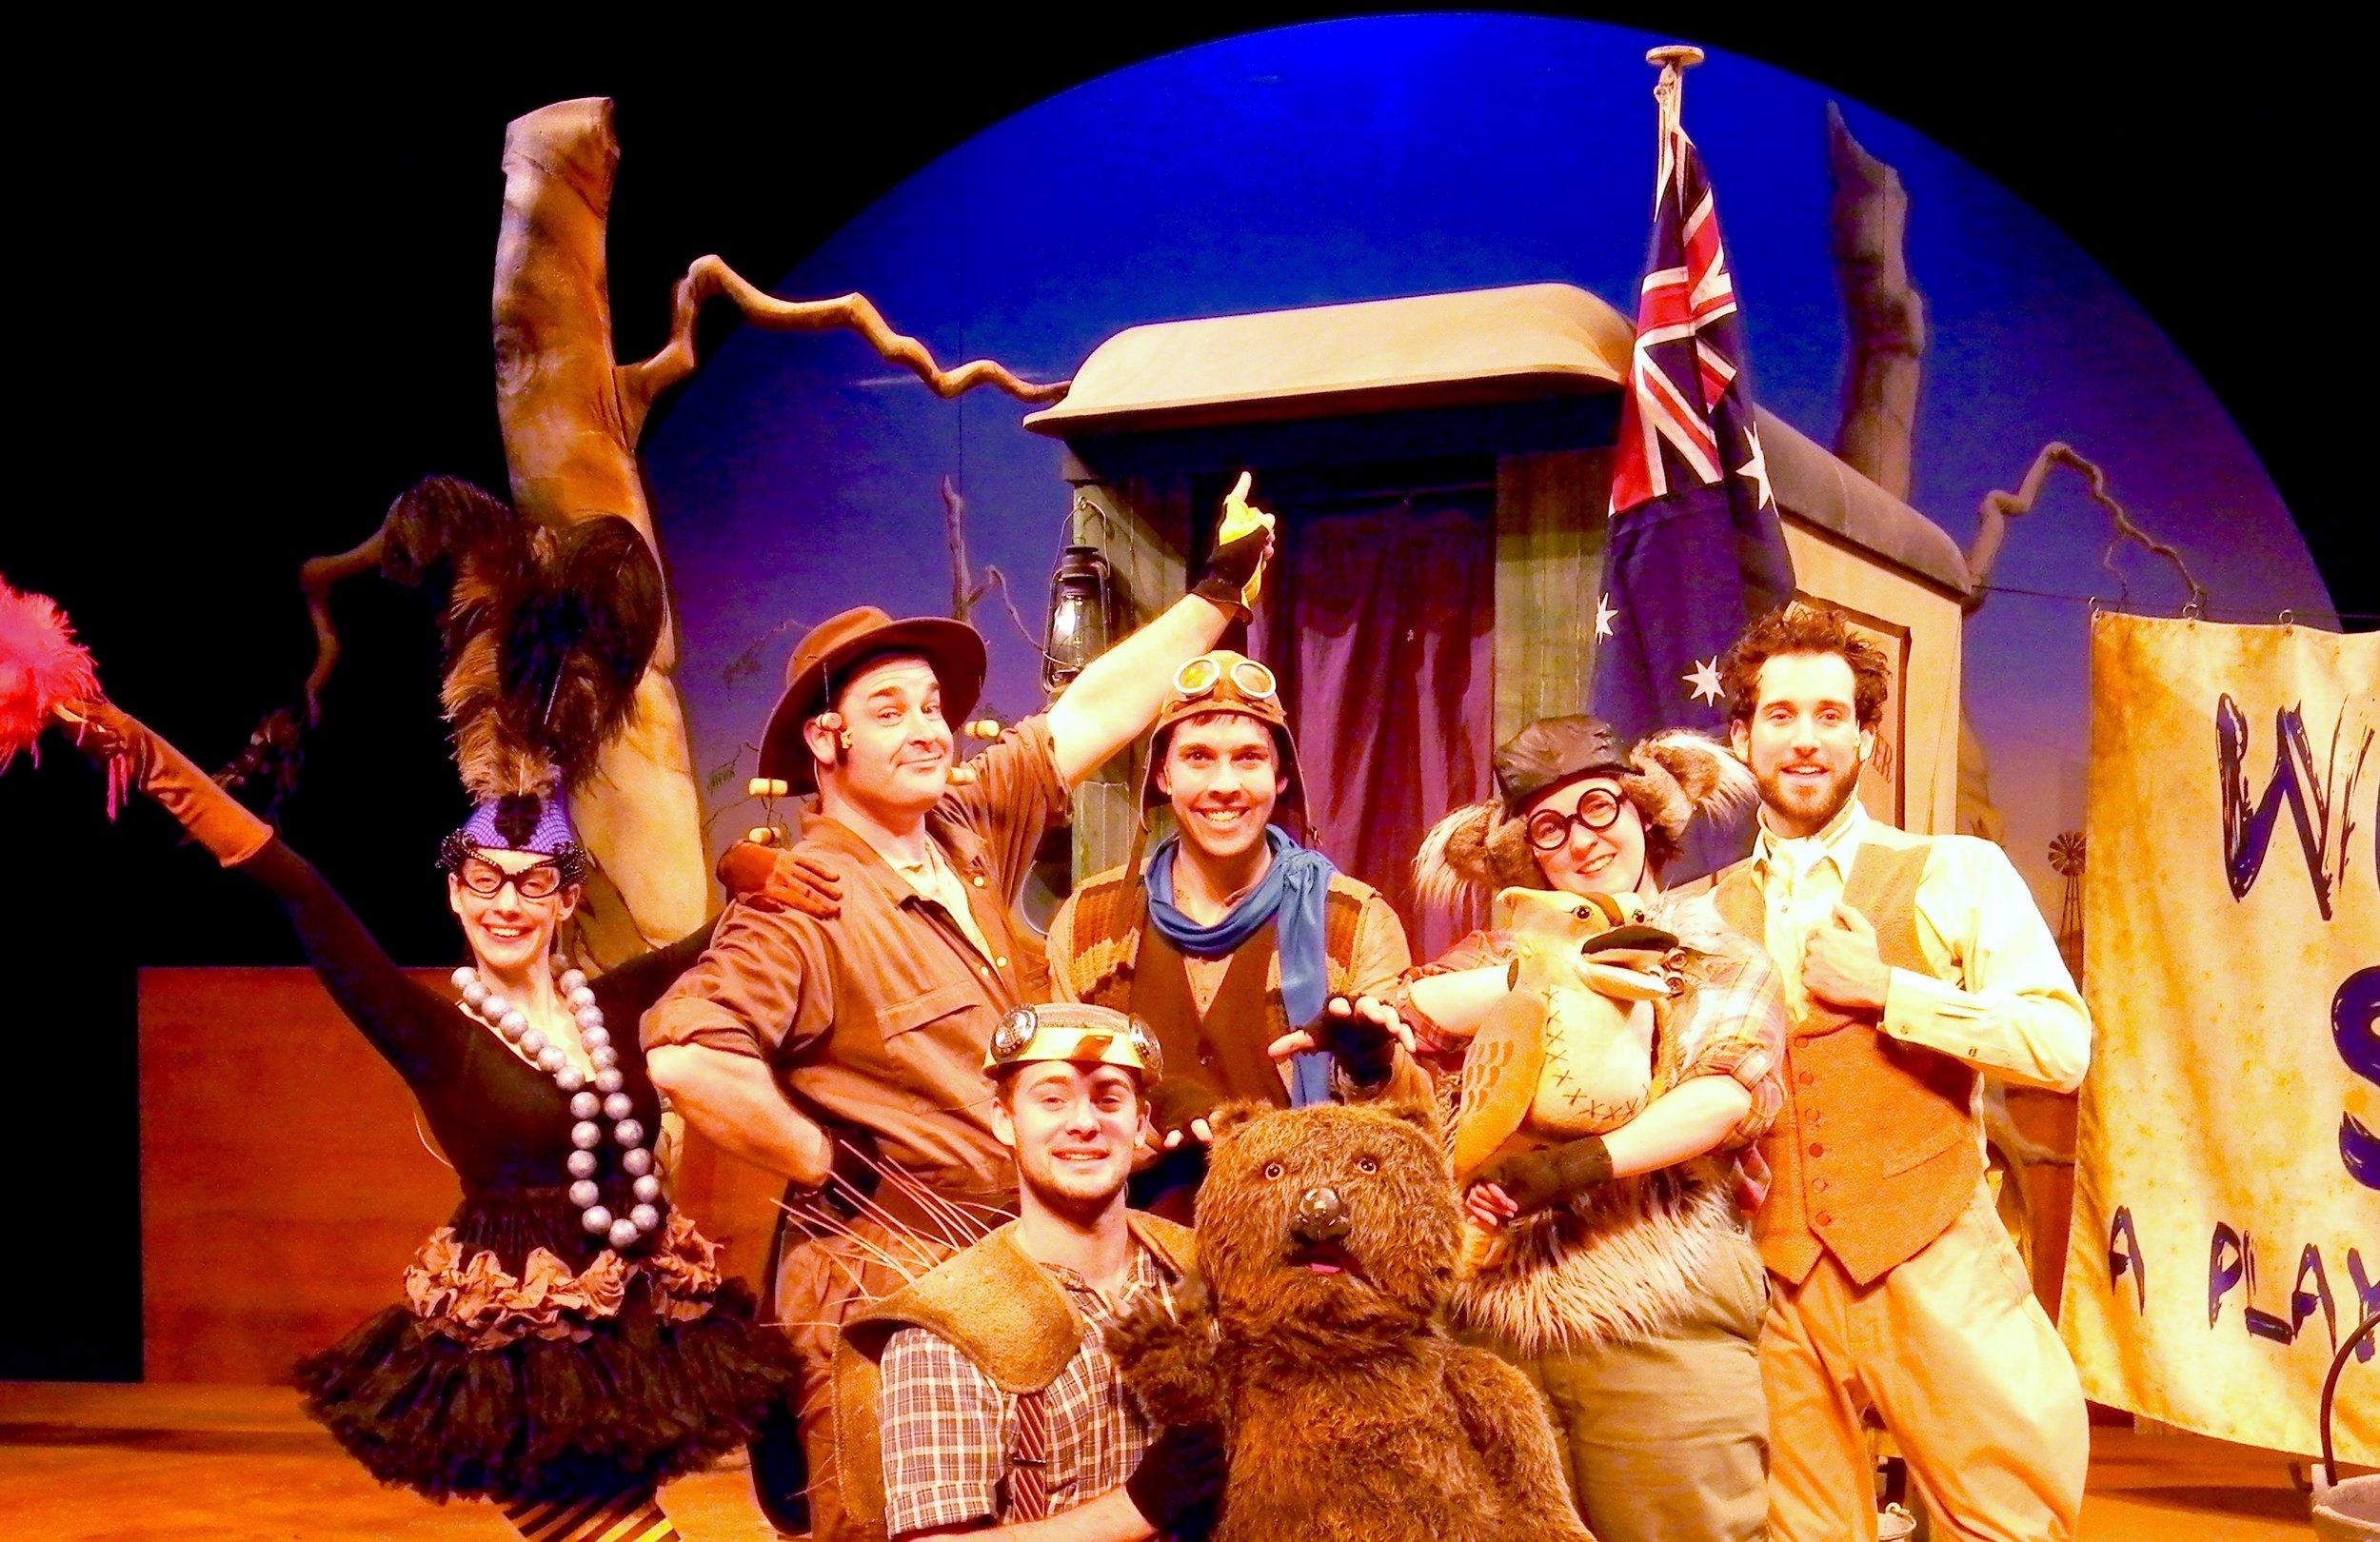 16 - The cast of Wombat Stew. jpg.jpg